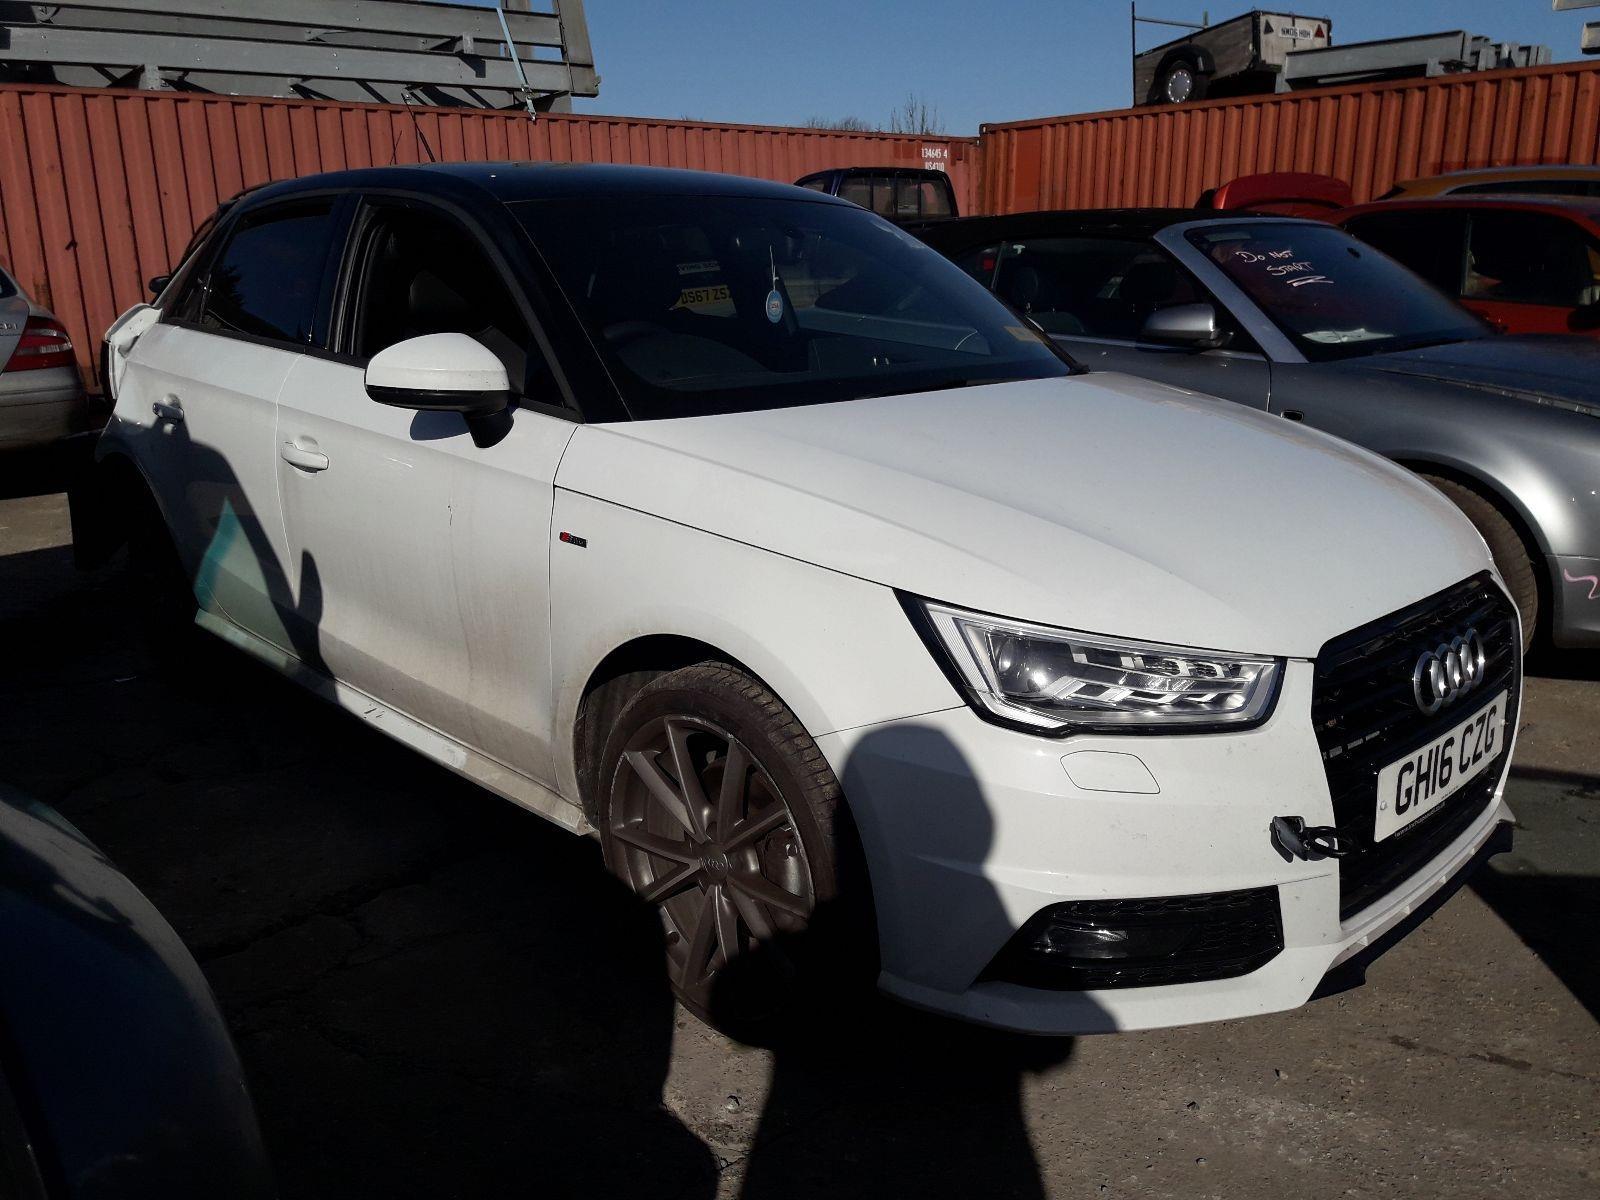 Synetiq Audi Mk1 Fl 8x 2010 To 2018 Sportback Tfsi S Line Black Edition Fuel Filler Flap Petrol Semi Auto For Sale